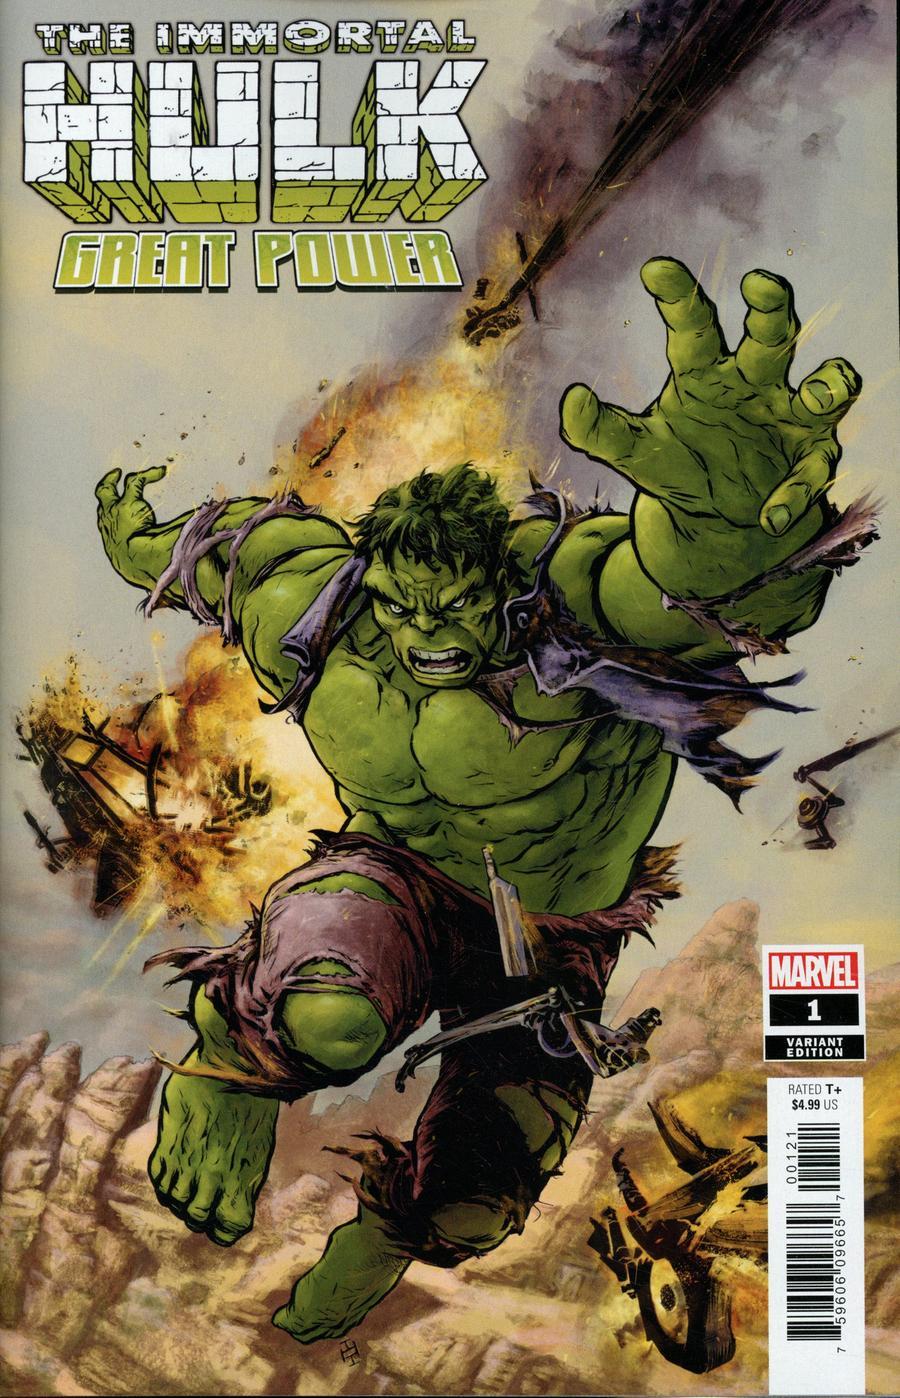 Immortal Hulk Great Power One Shot Cover B Variant Max Fiumara Cover